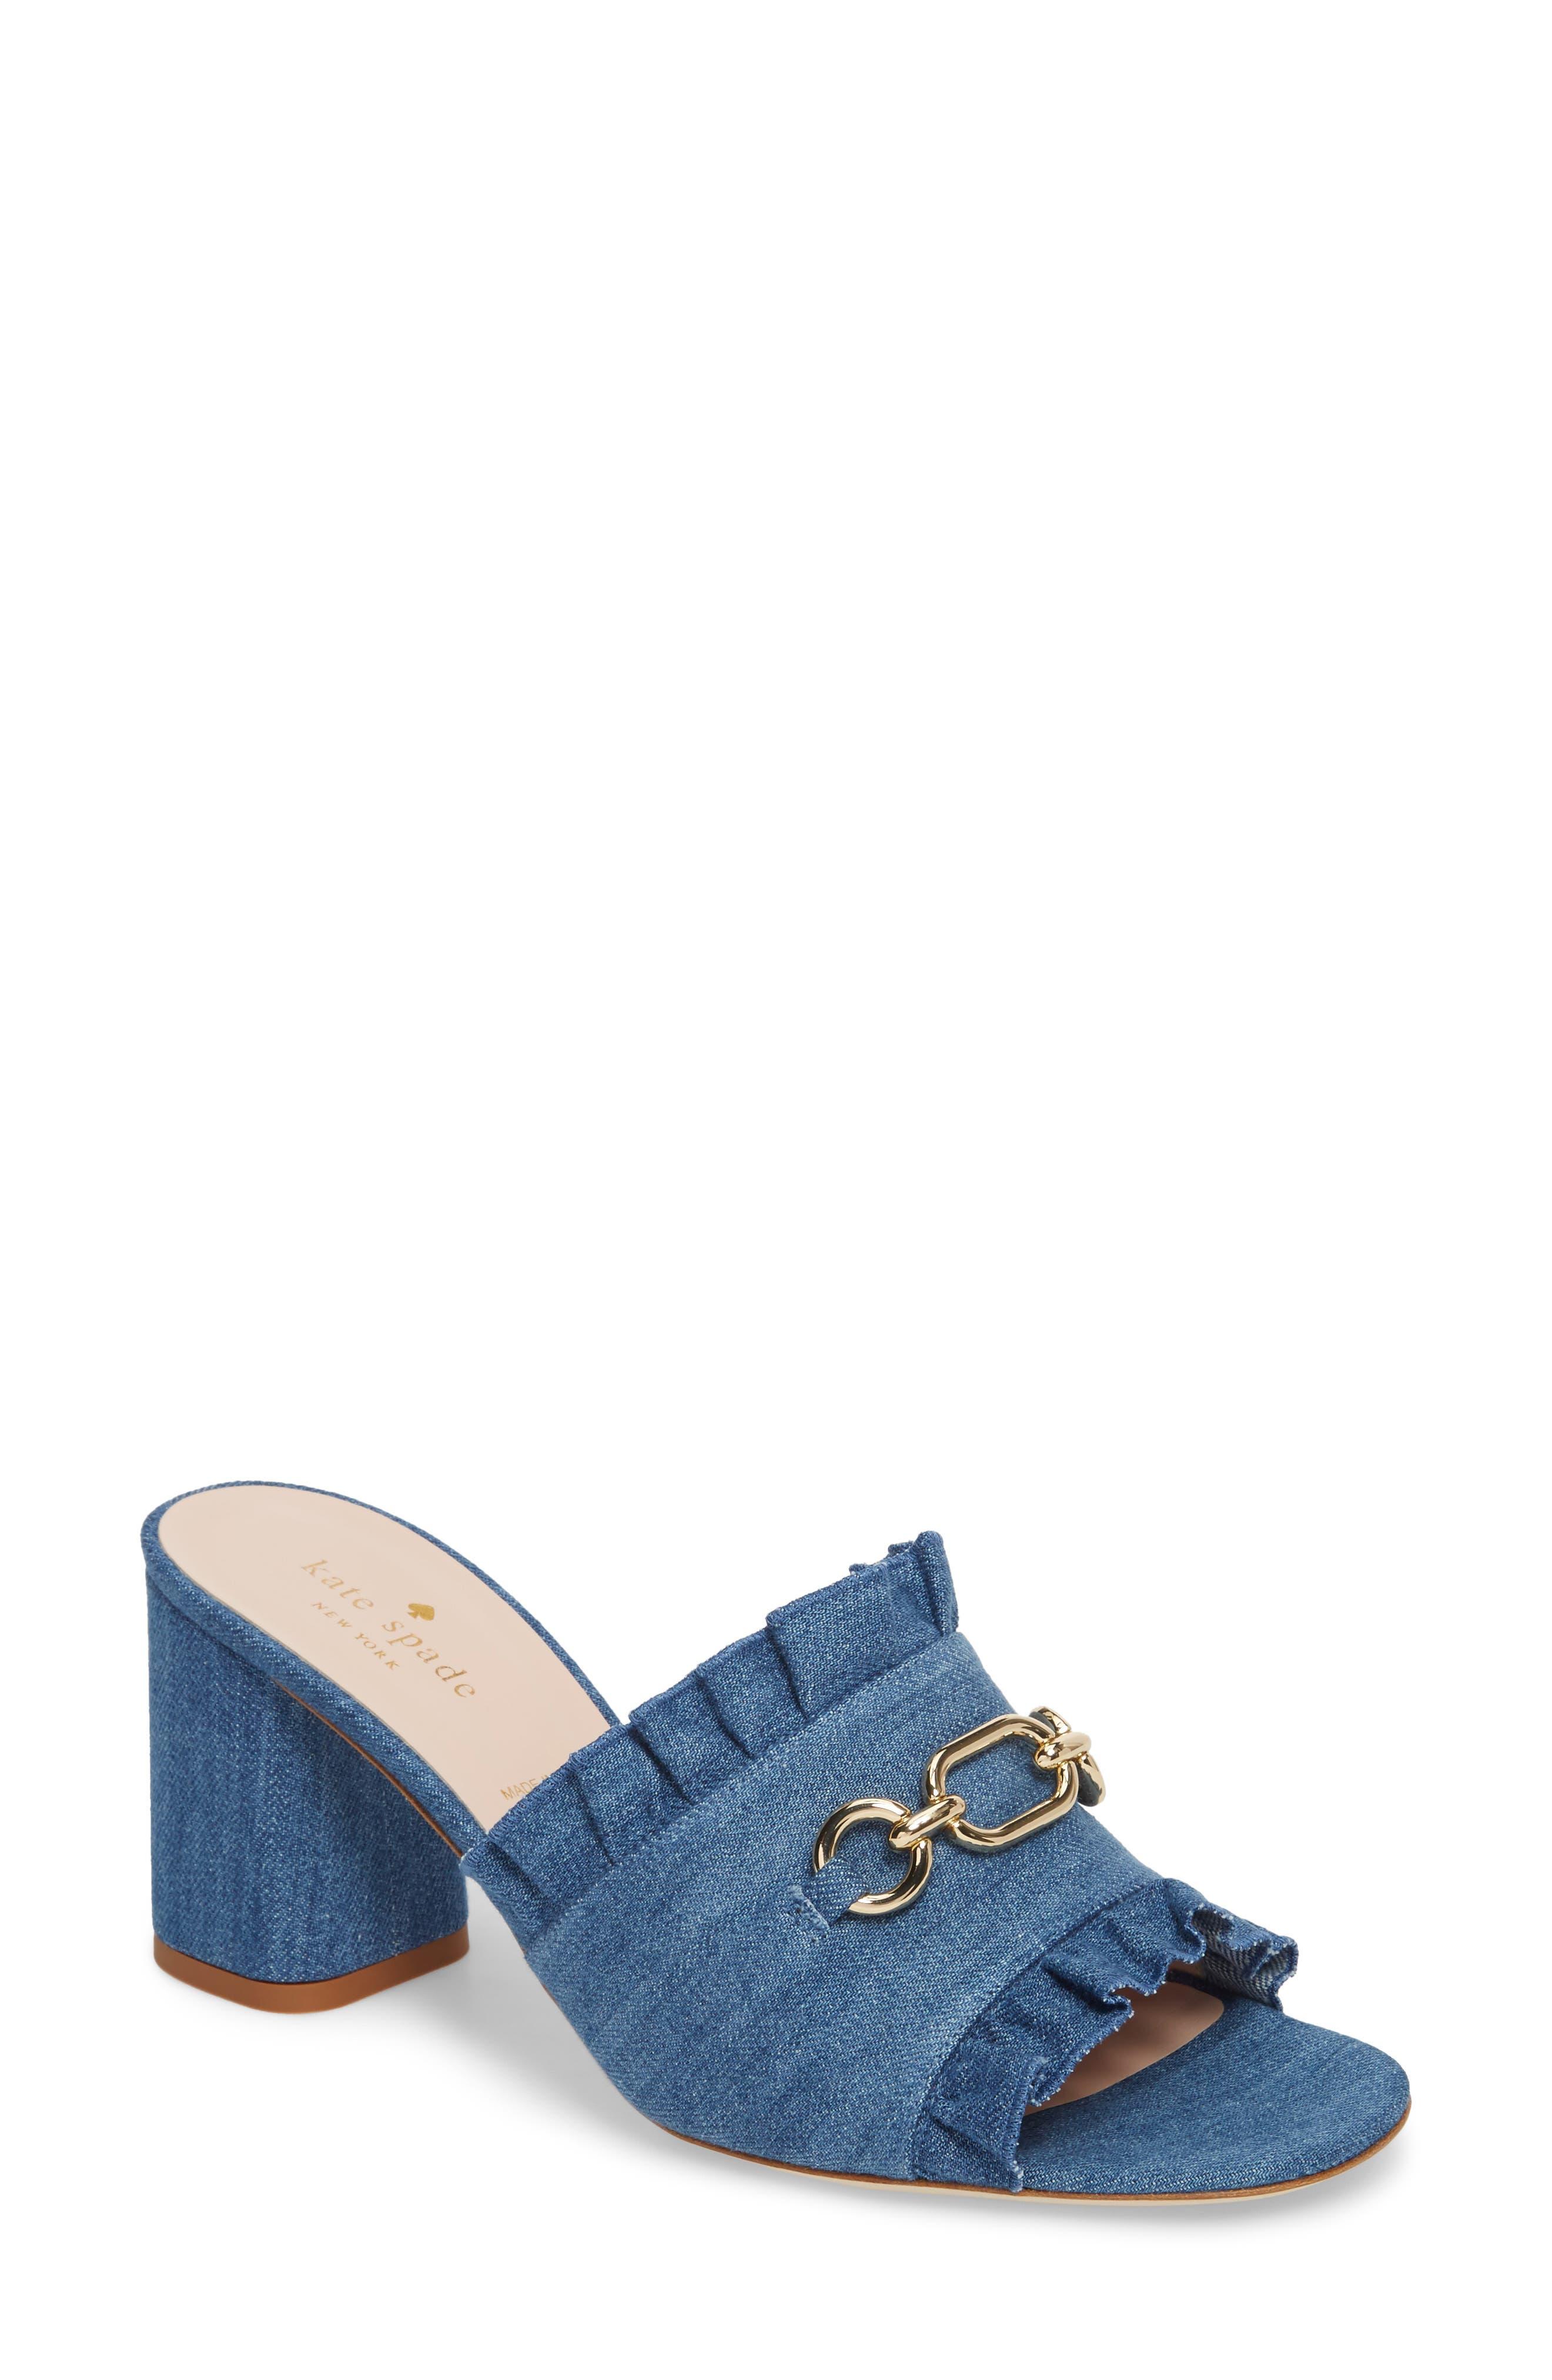 Alternate Image 1 Selected - kate spade new york demmi sandal (Women)